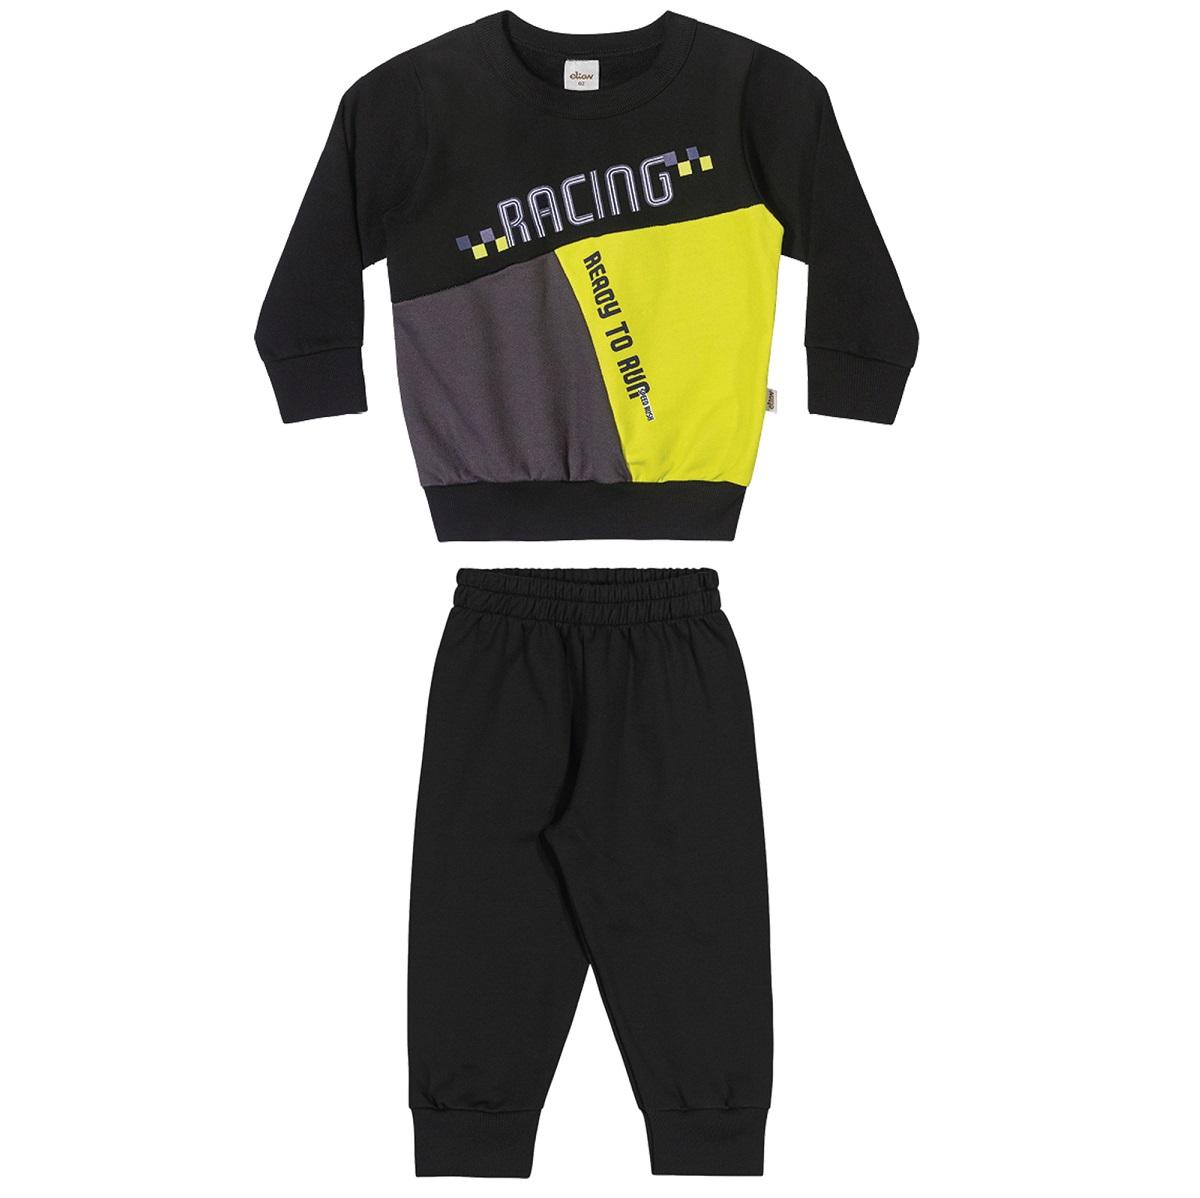 Conjunto Infantil Masculino Blusa e Calça - ELIAN 221109